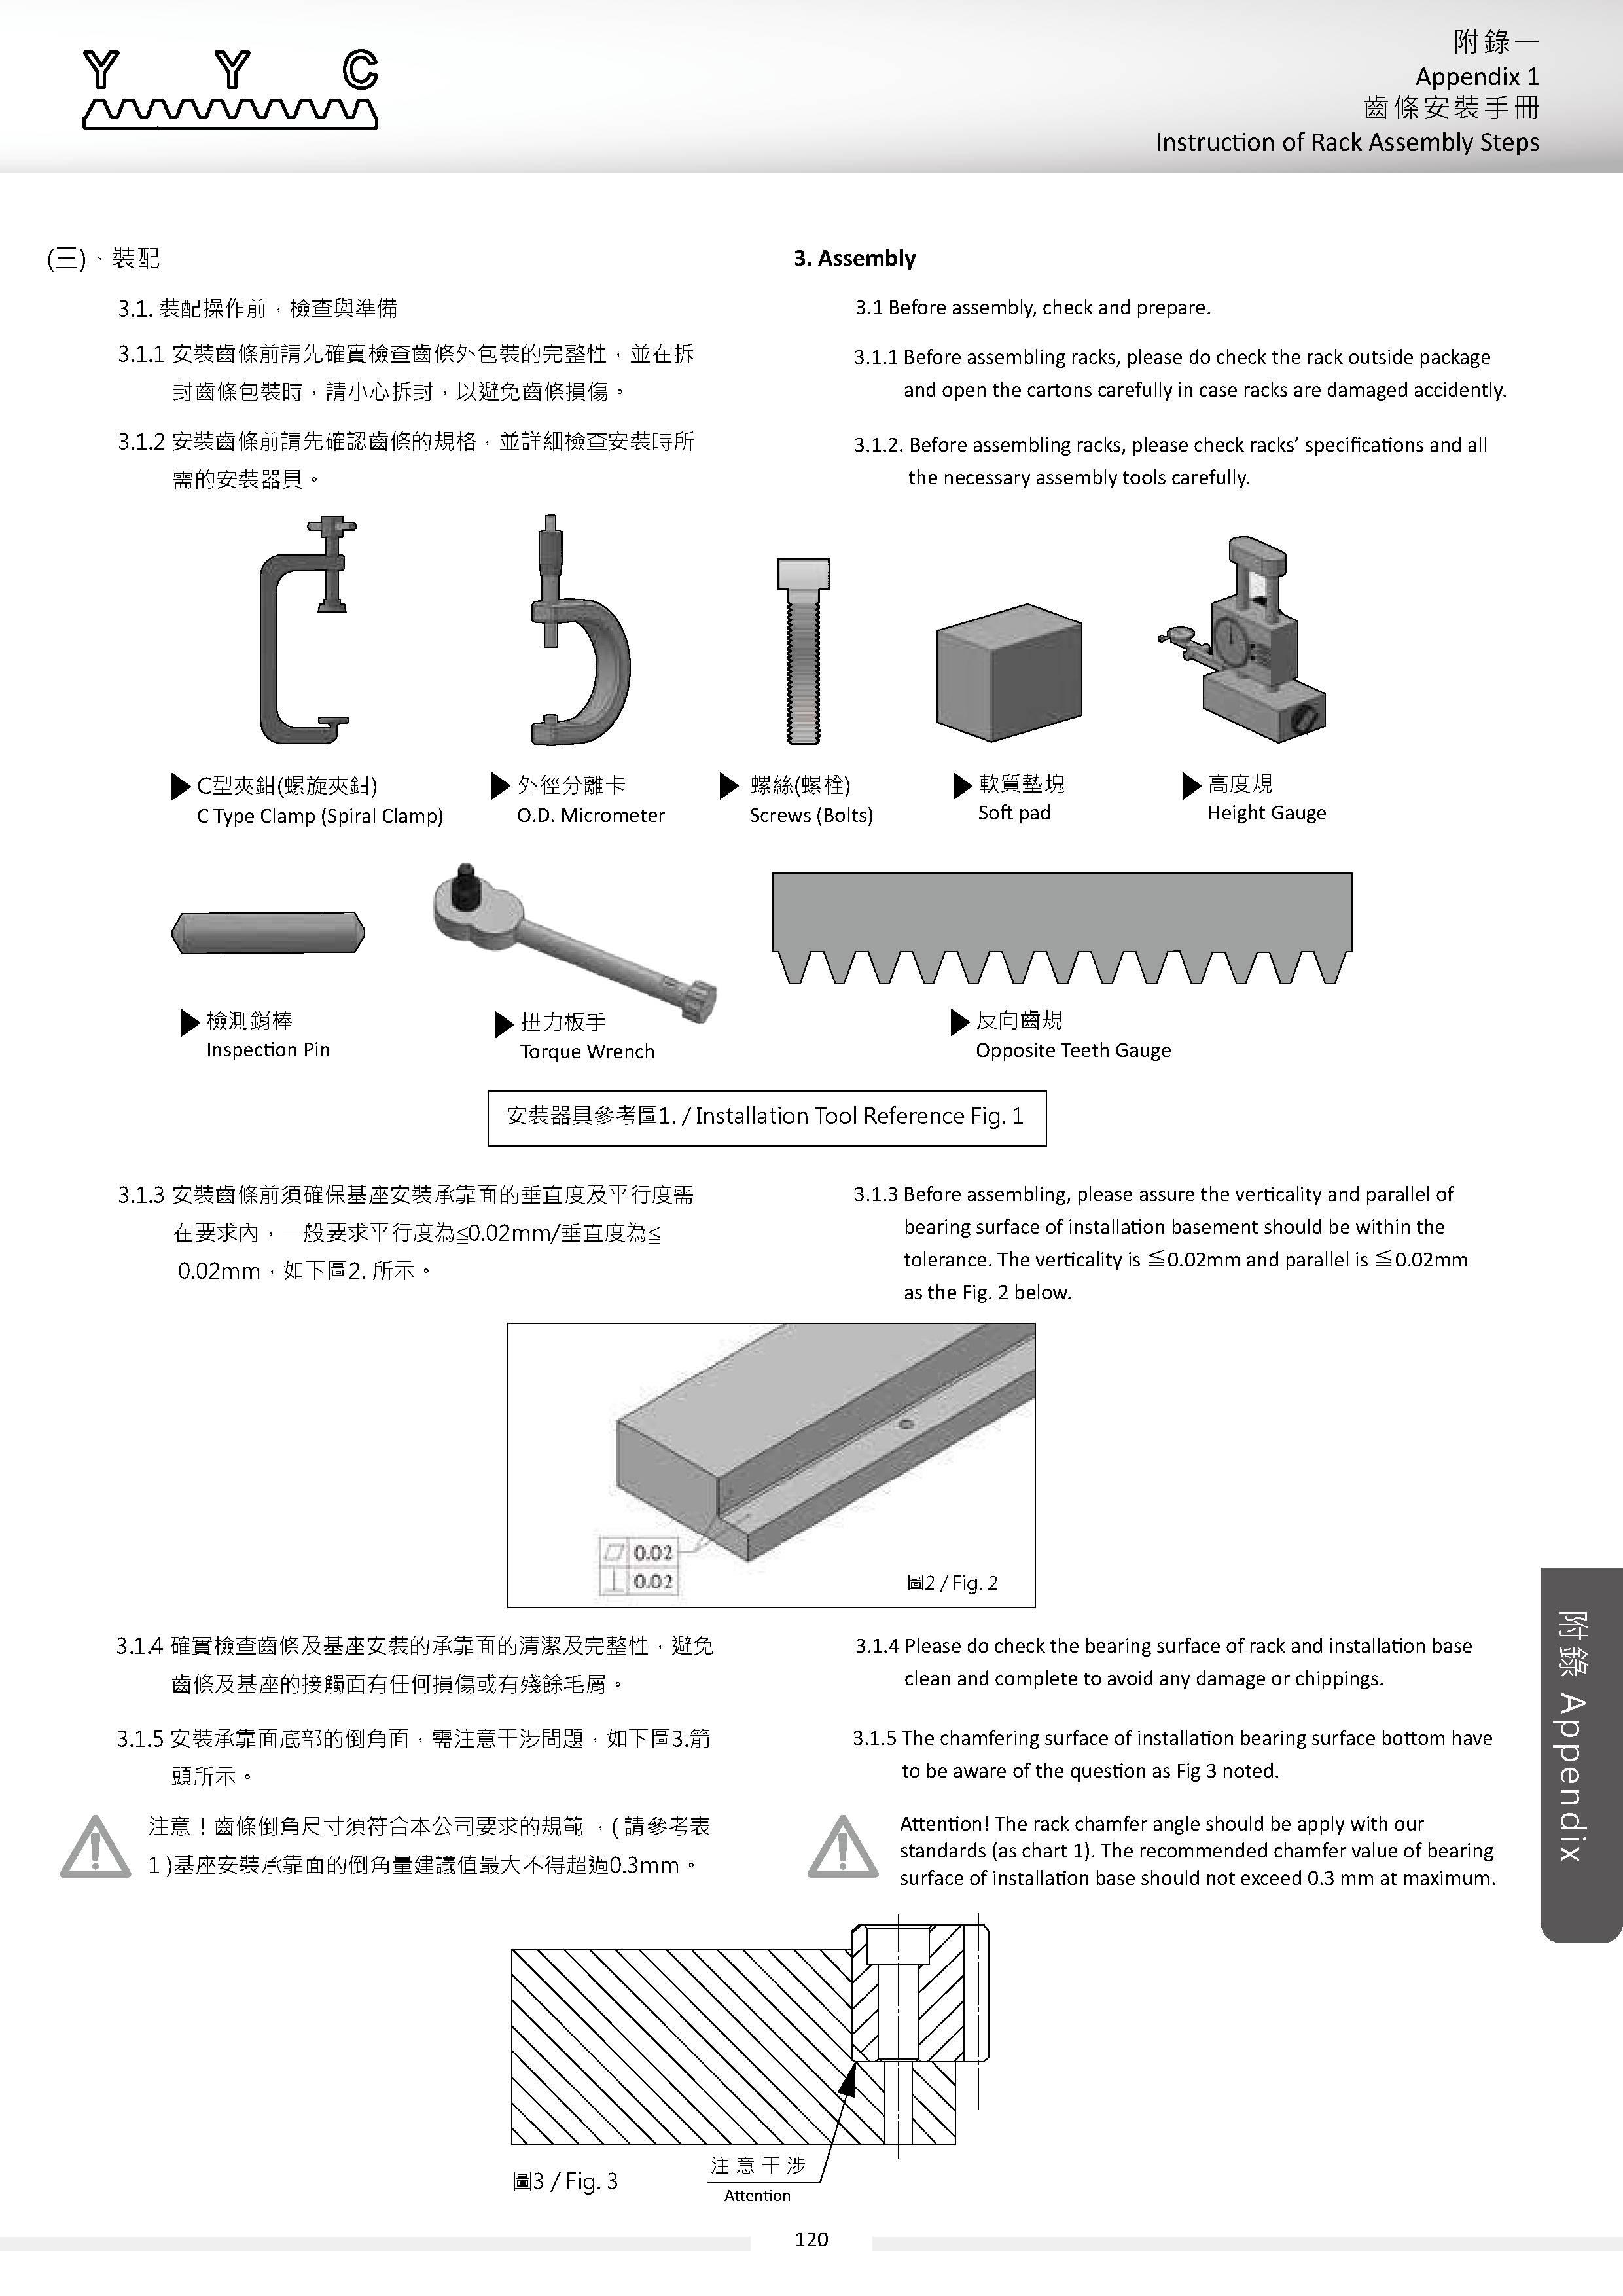 Instruction of Rack Assembly Steps 齒條安裝手冊2